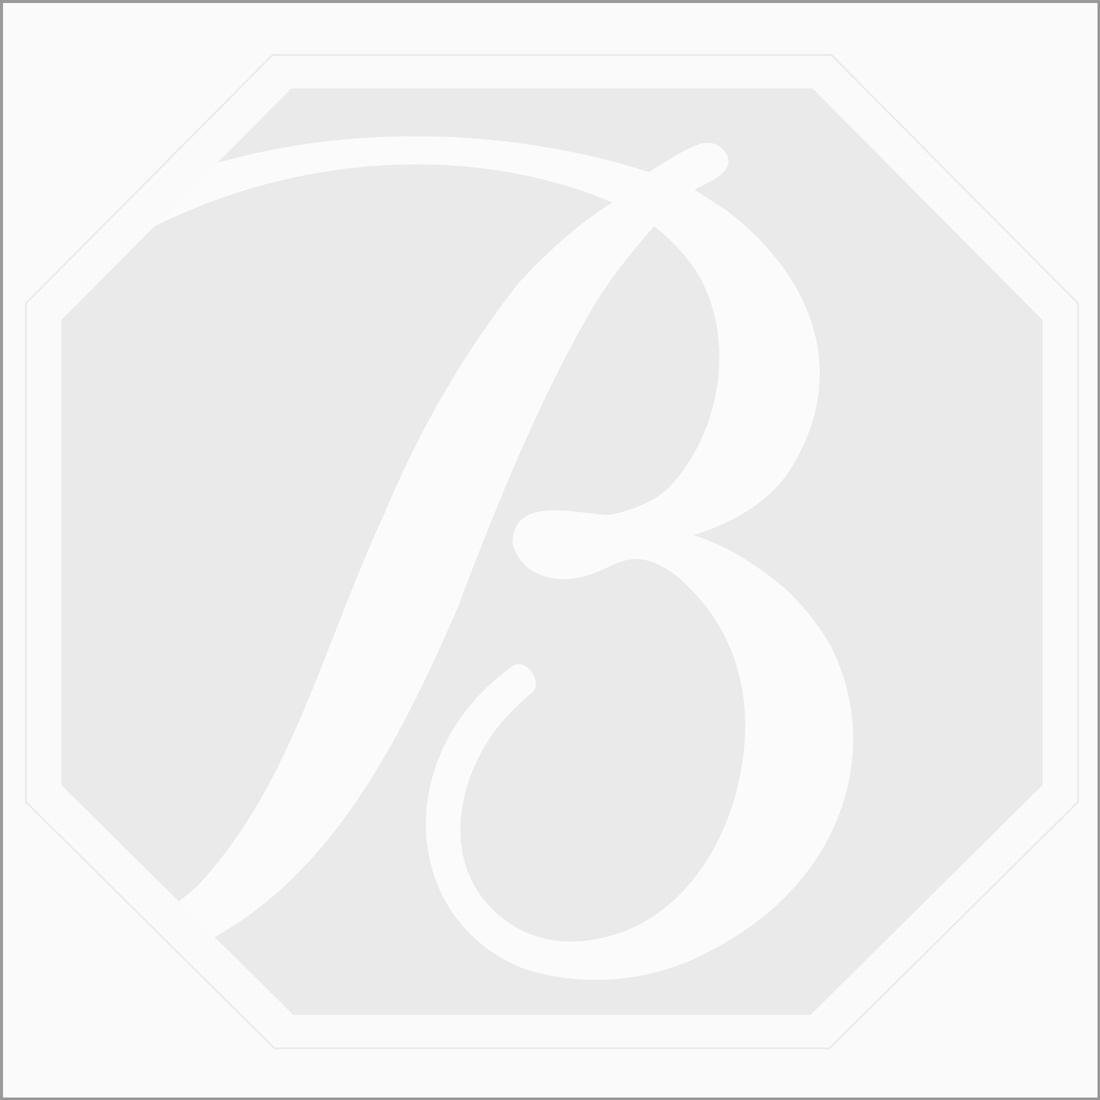 3 Pc. White Diamond Briolette - 4.11 ct. - 7.4 x 4.6 x 4 mm, 8 x 5 x 4.5 mm, 7.5 x 4.5 x 4.5 mm (DBR1005)